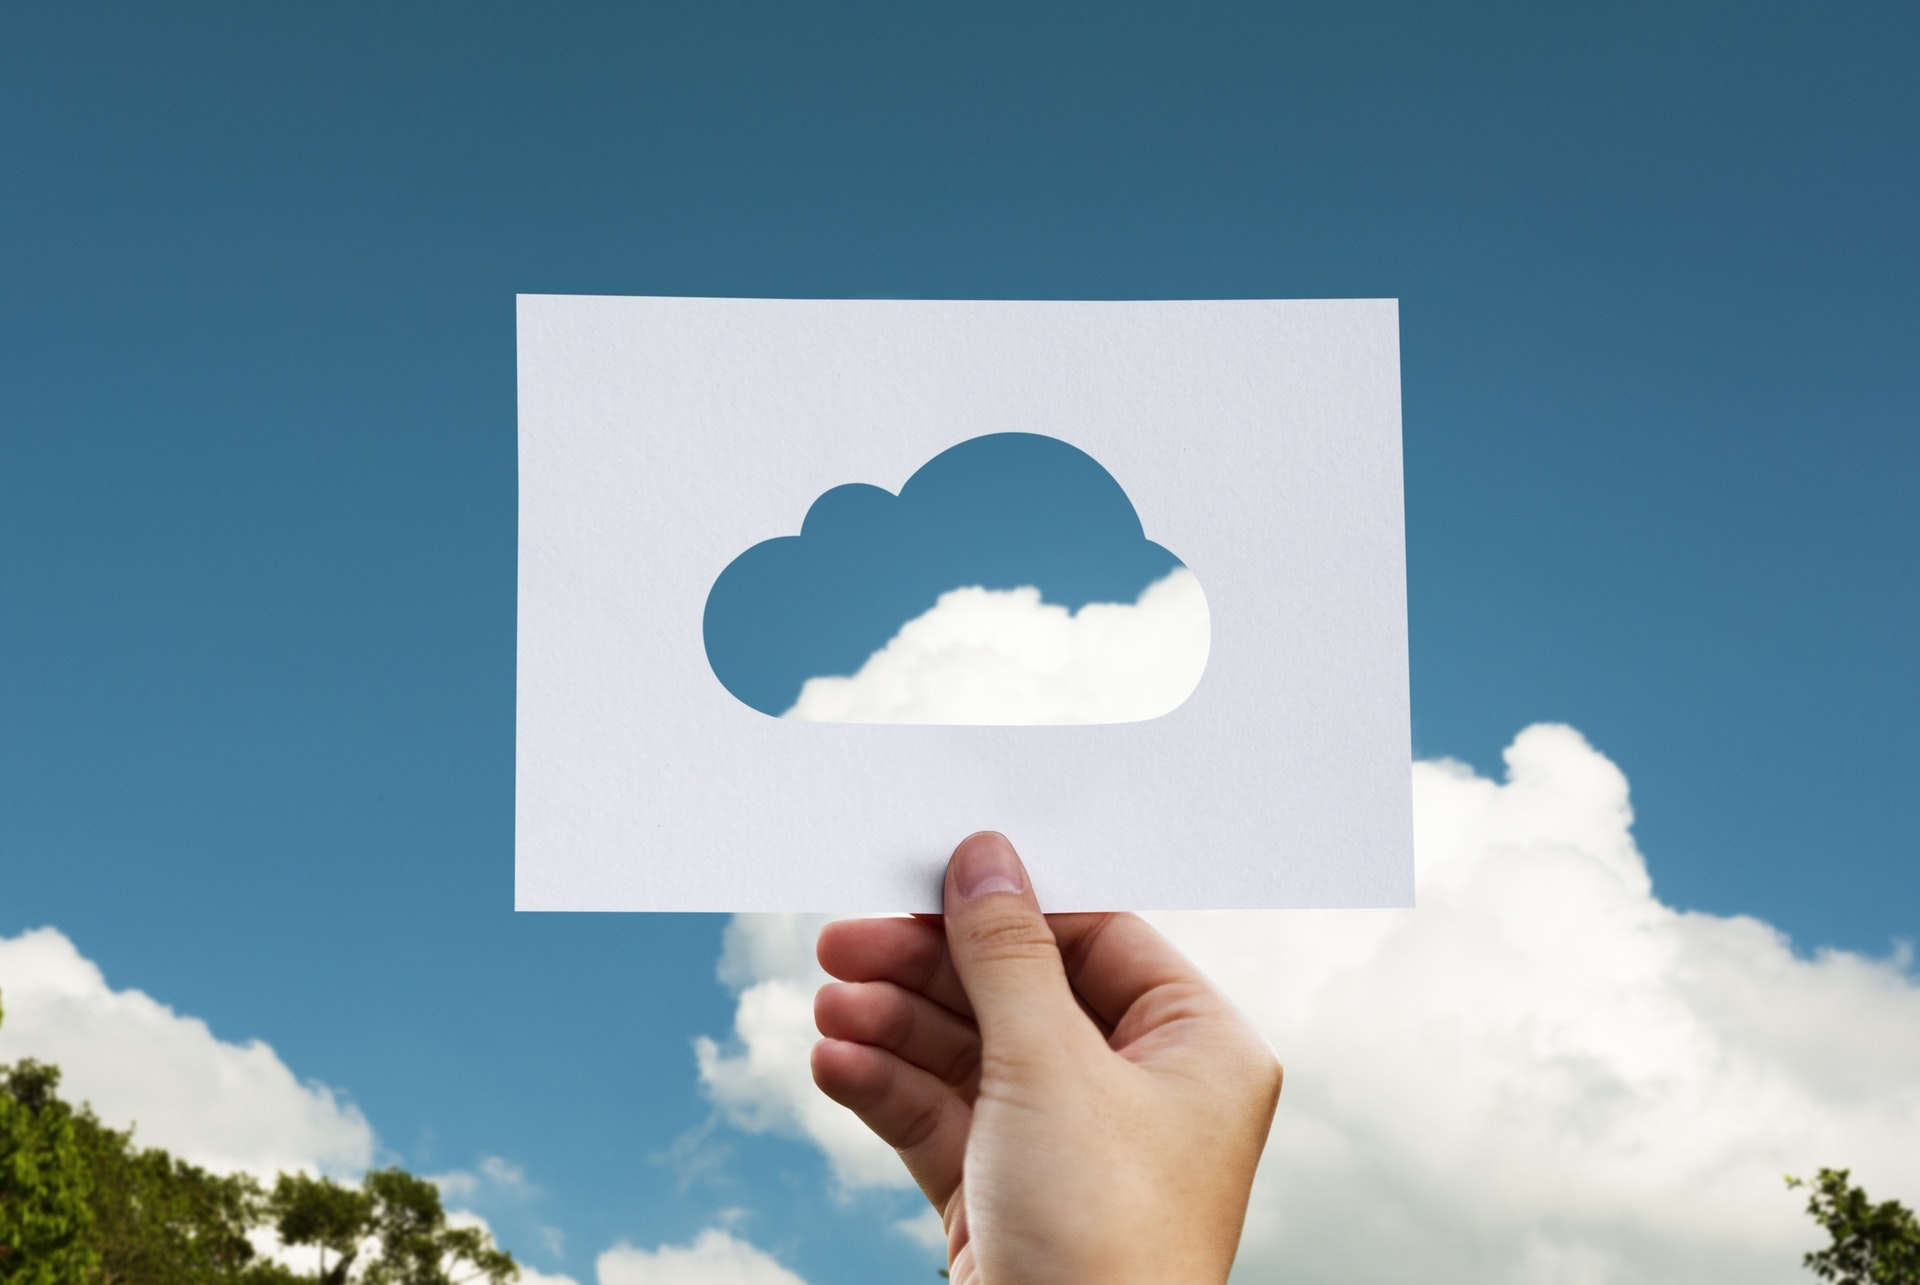 paper cloud against the sky.jpeg